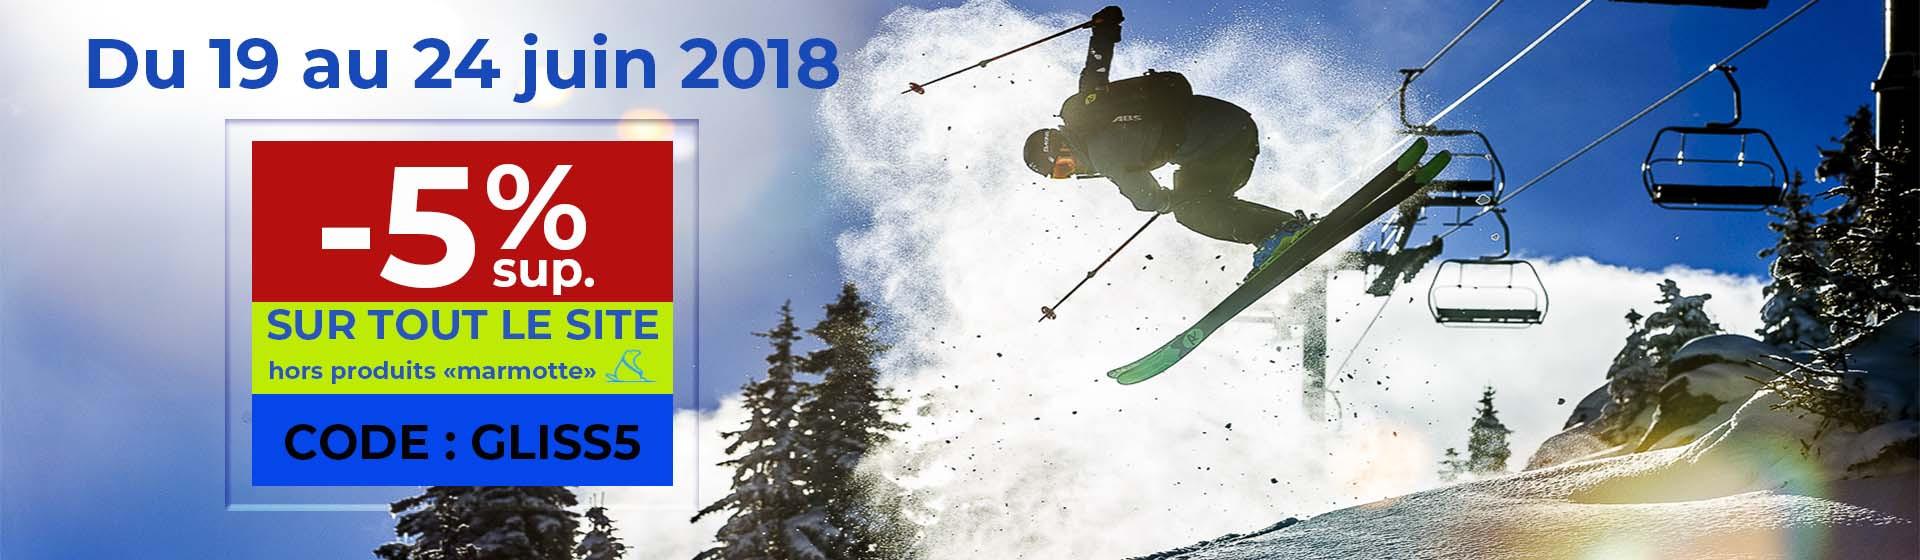 Promo -5% du 19 au 24 juin 2018